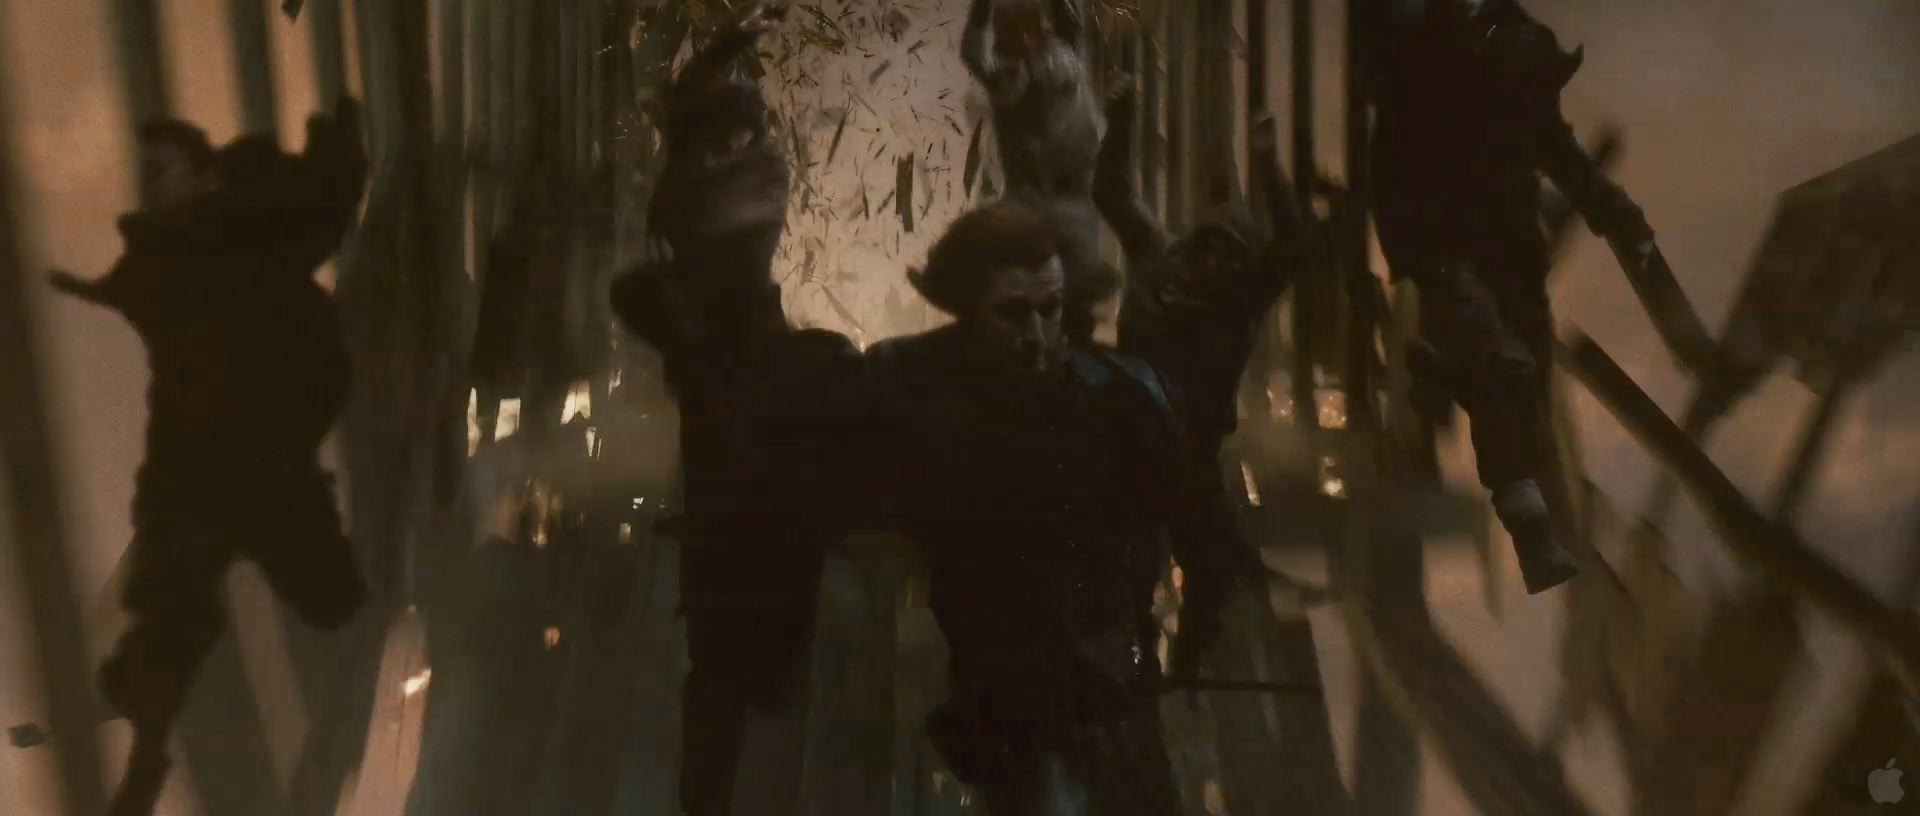 Harry Potter BlogHogwarts HP7 2 Trailer 74